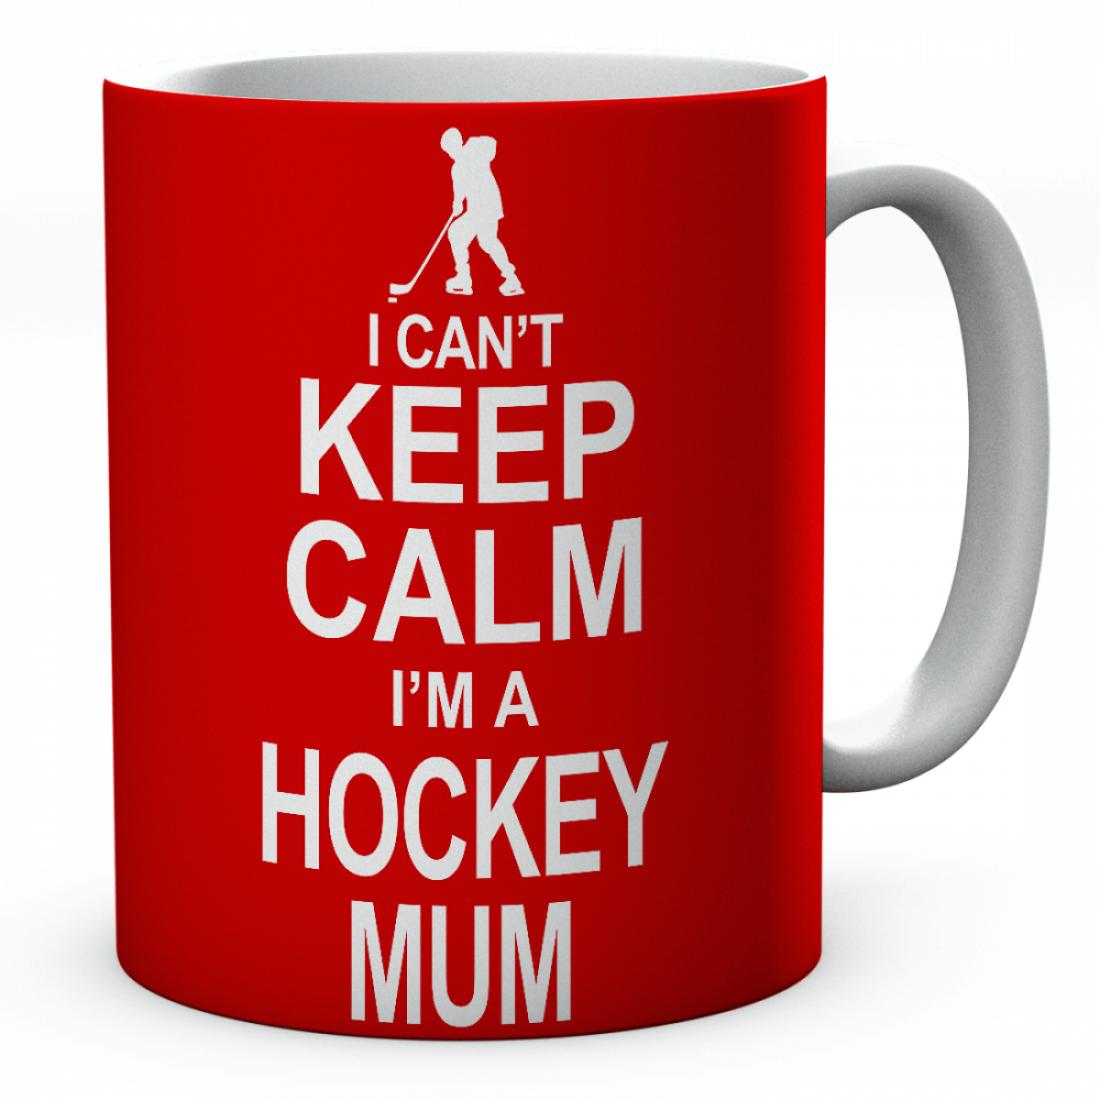 I Can't Keep Calm I'm A Hockey Mum Ceramic Mug